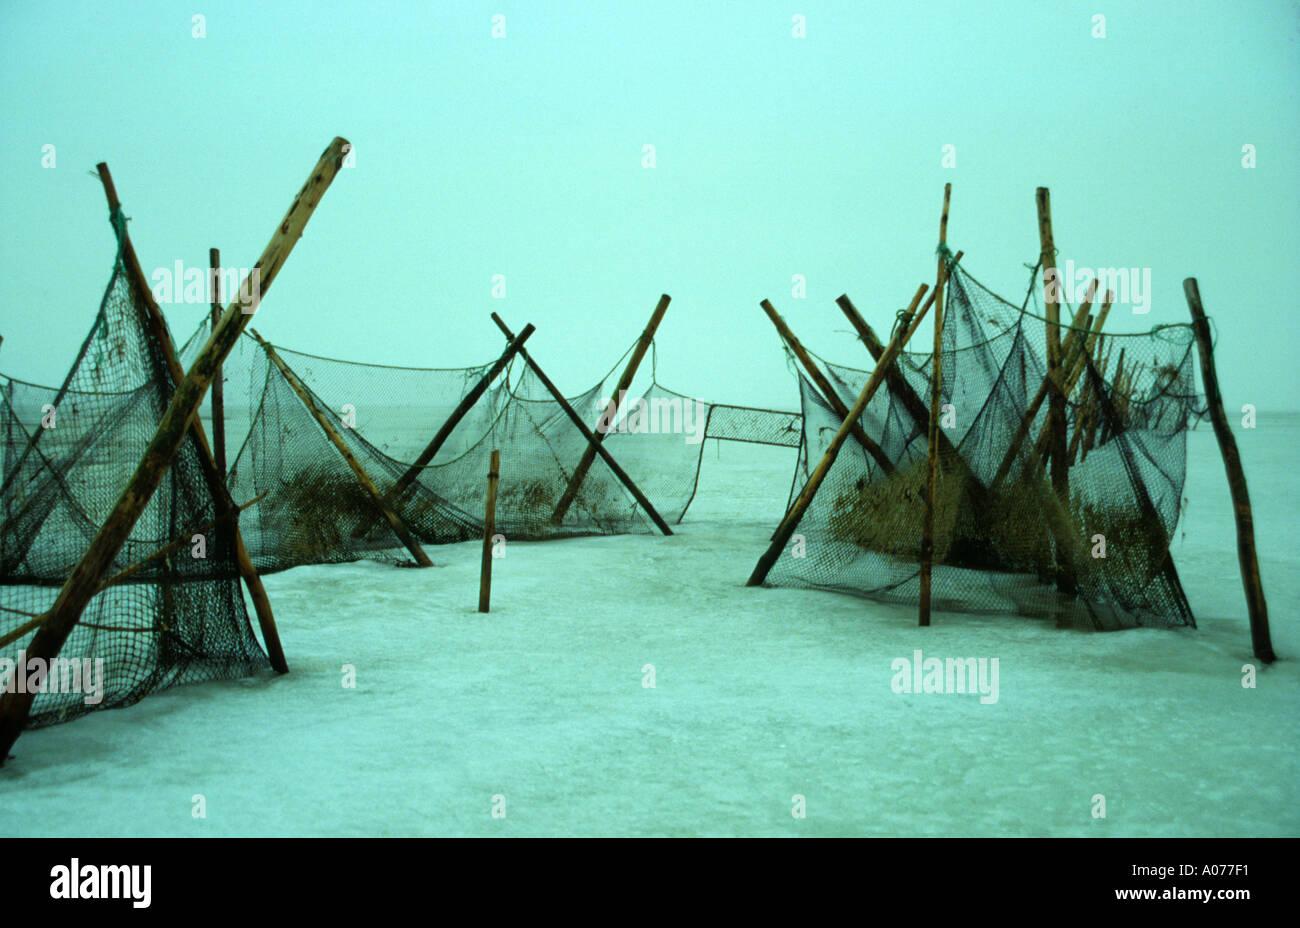 Watten stock photos watten stock images alamy for Frozen fishing pole